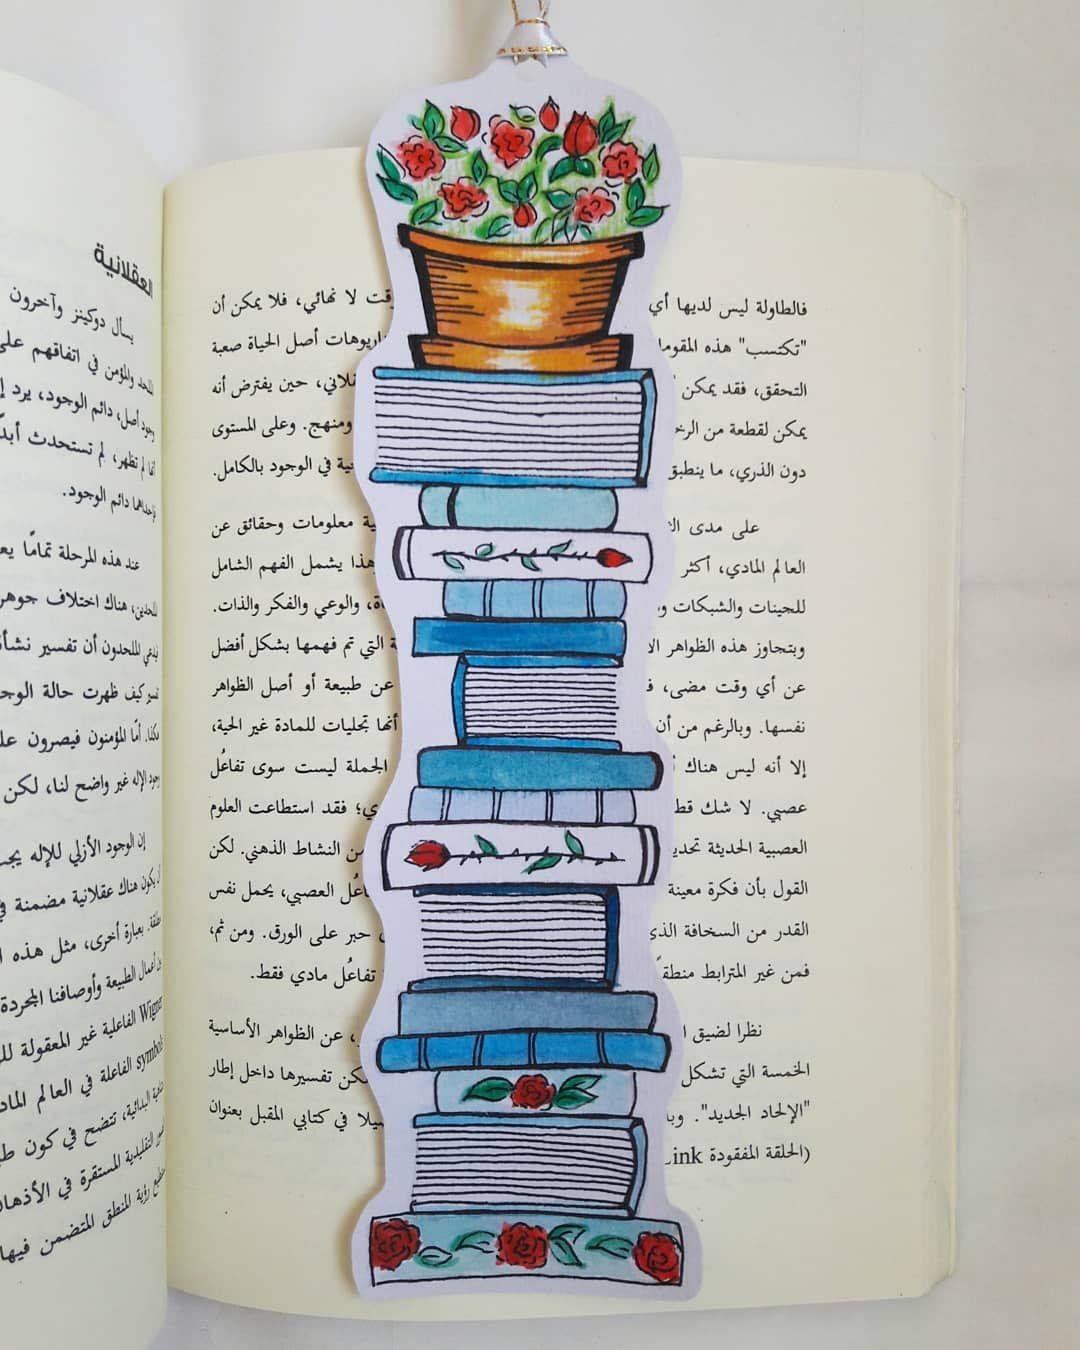 Ftm Art Bookmark فواصل كتب هدية لمحب ي الكتب متوفر توصيل للمحافظات Bookaddict Lipan Art Good Morning Quotes